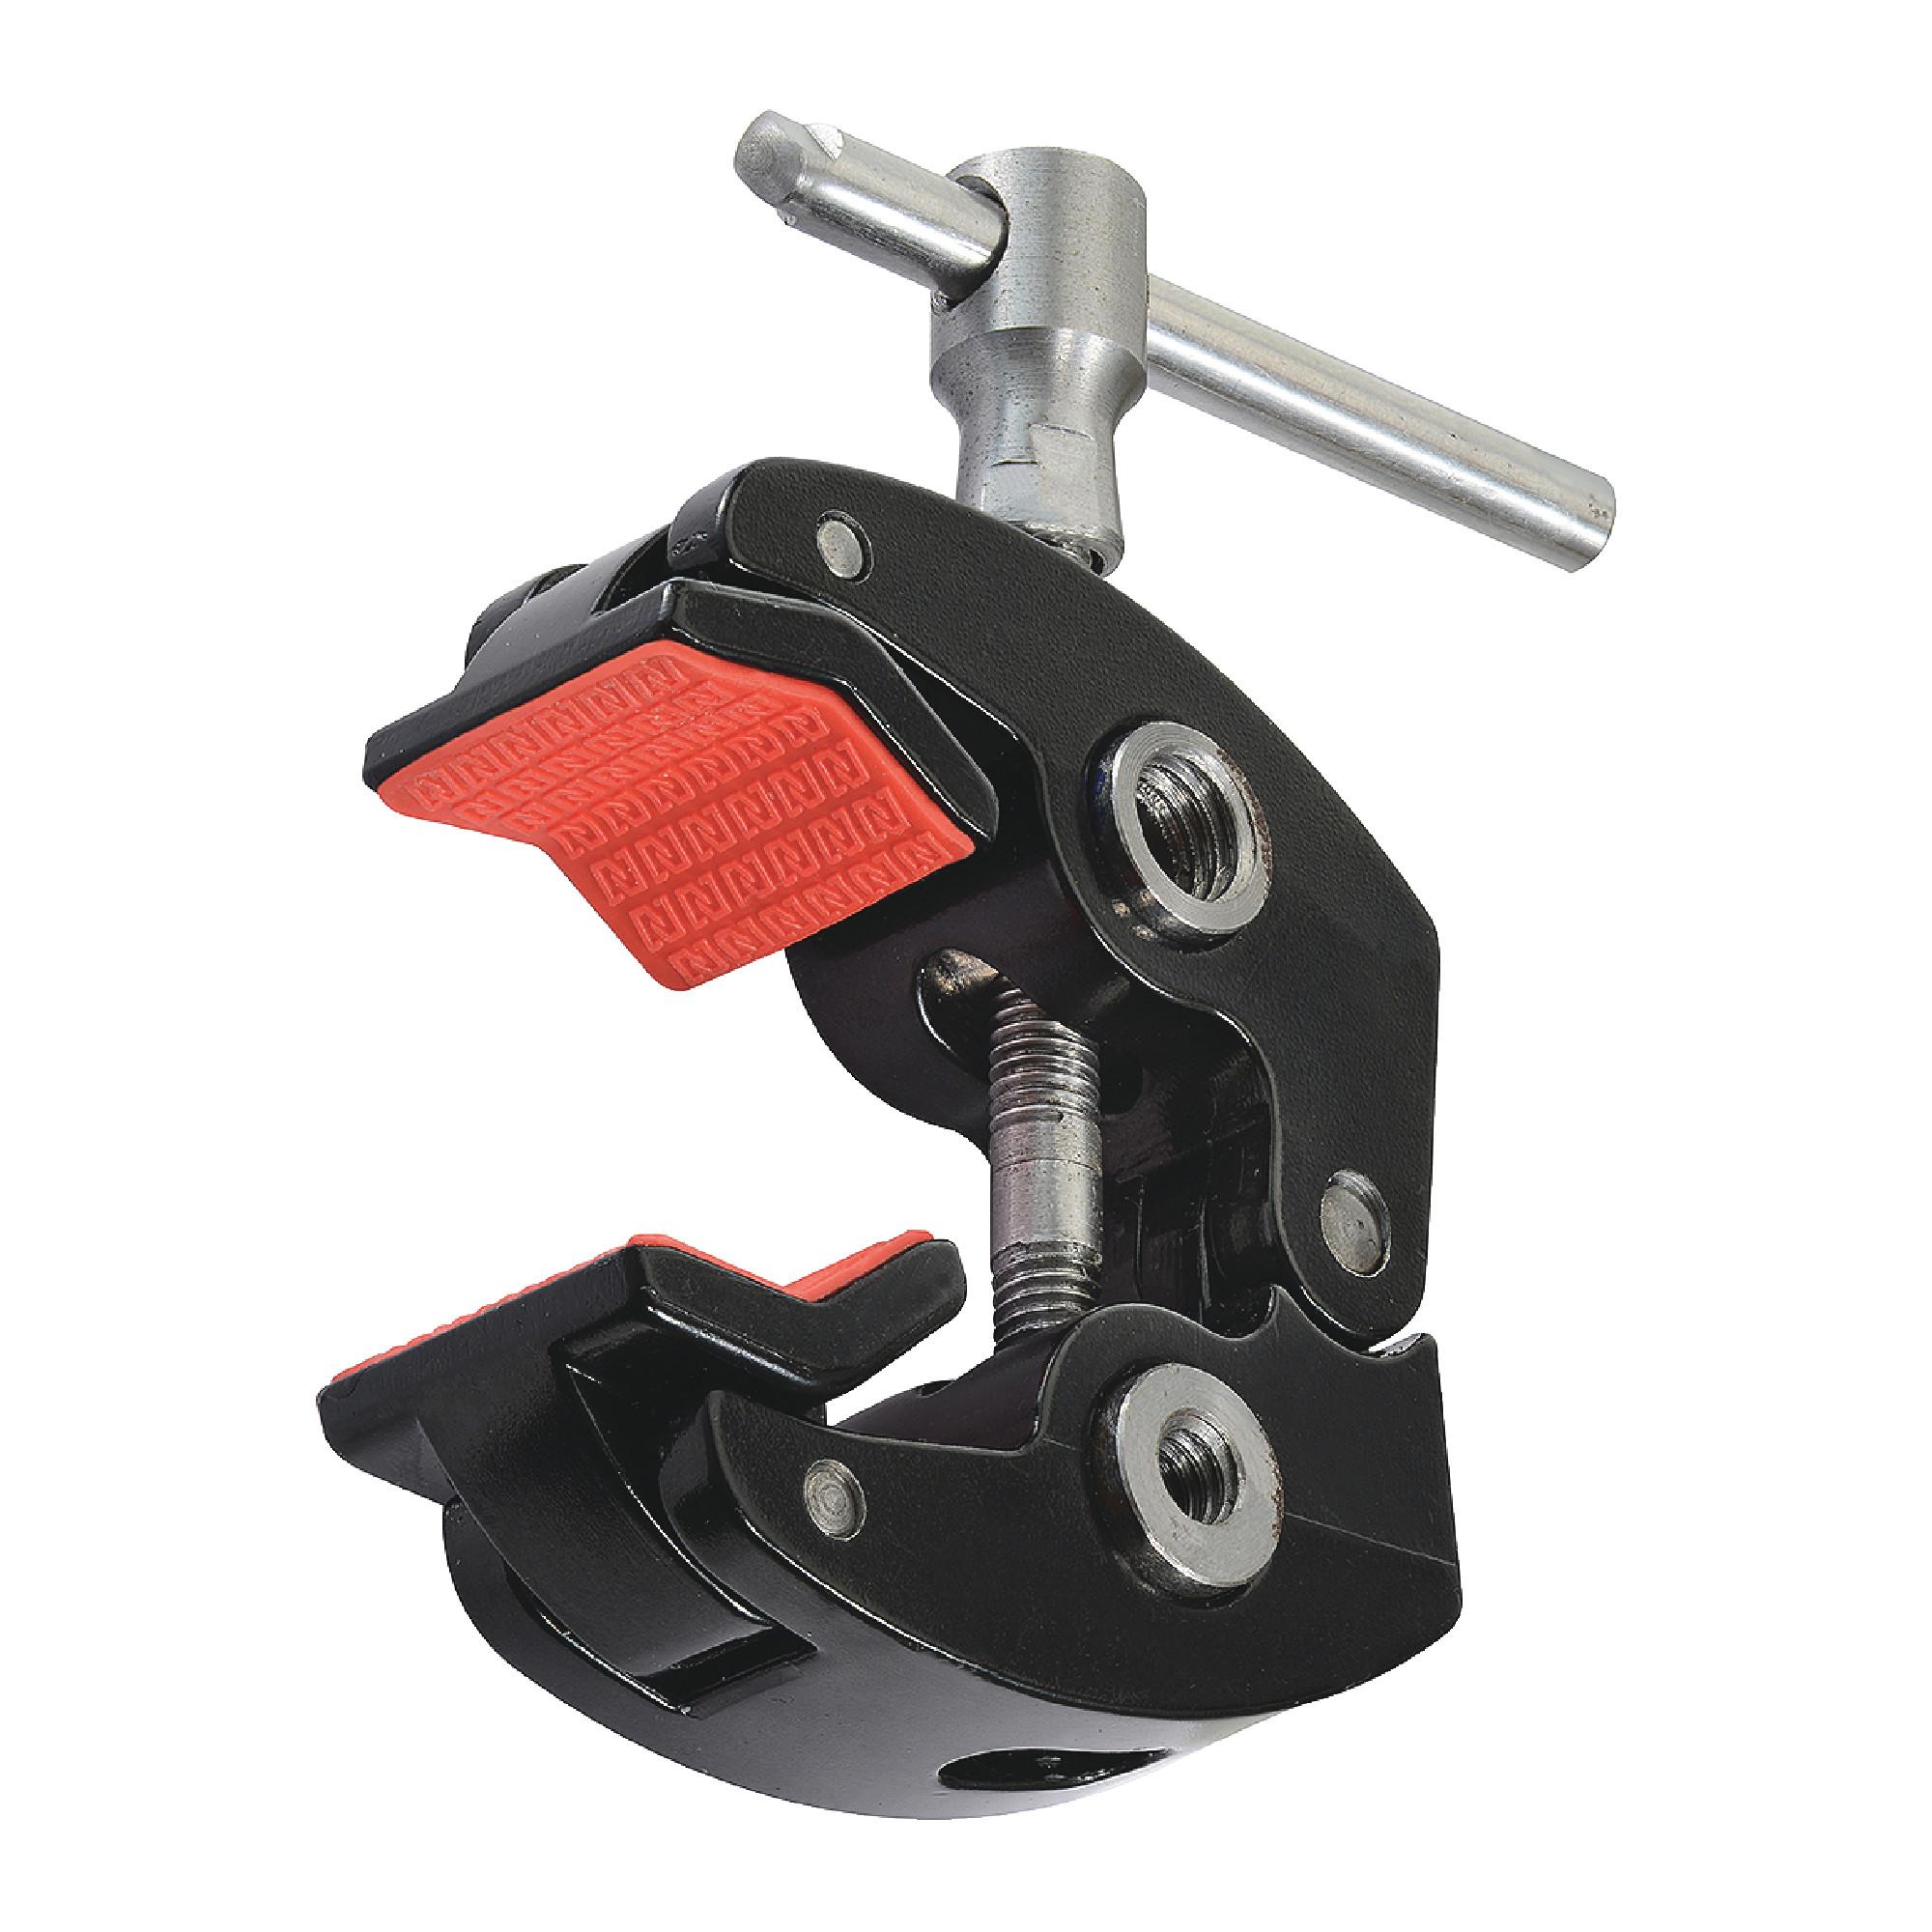 CS4550 45mm Clamp